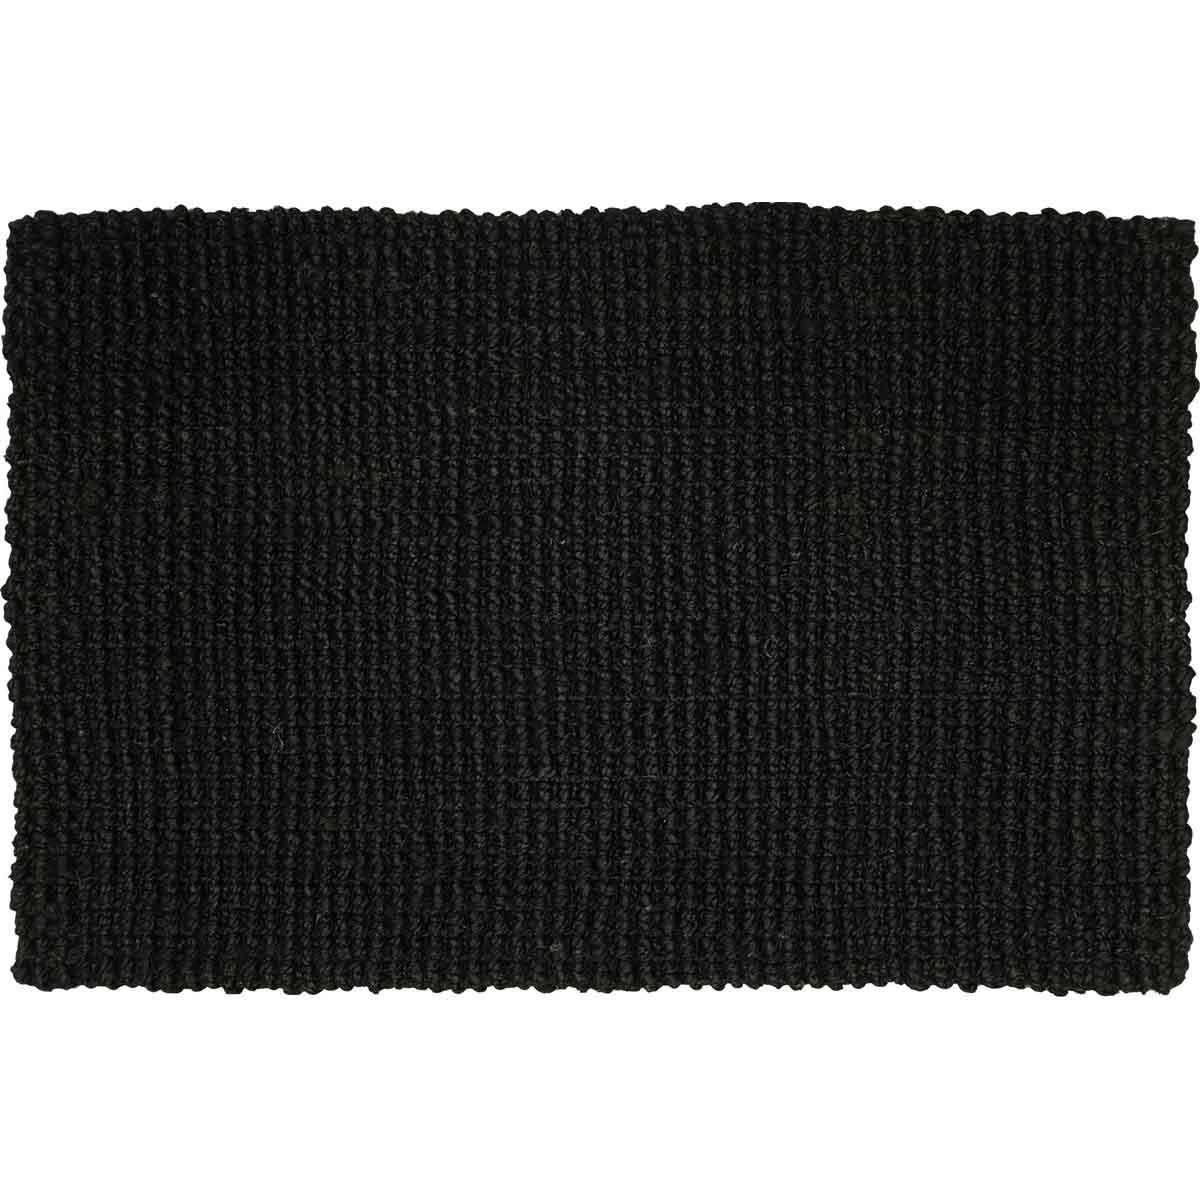 Skåne dörrmatta jute svart 60x90